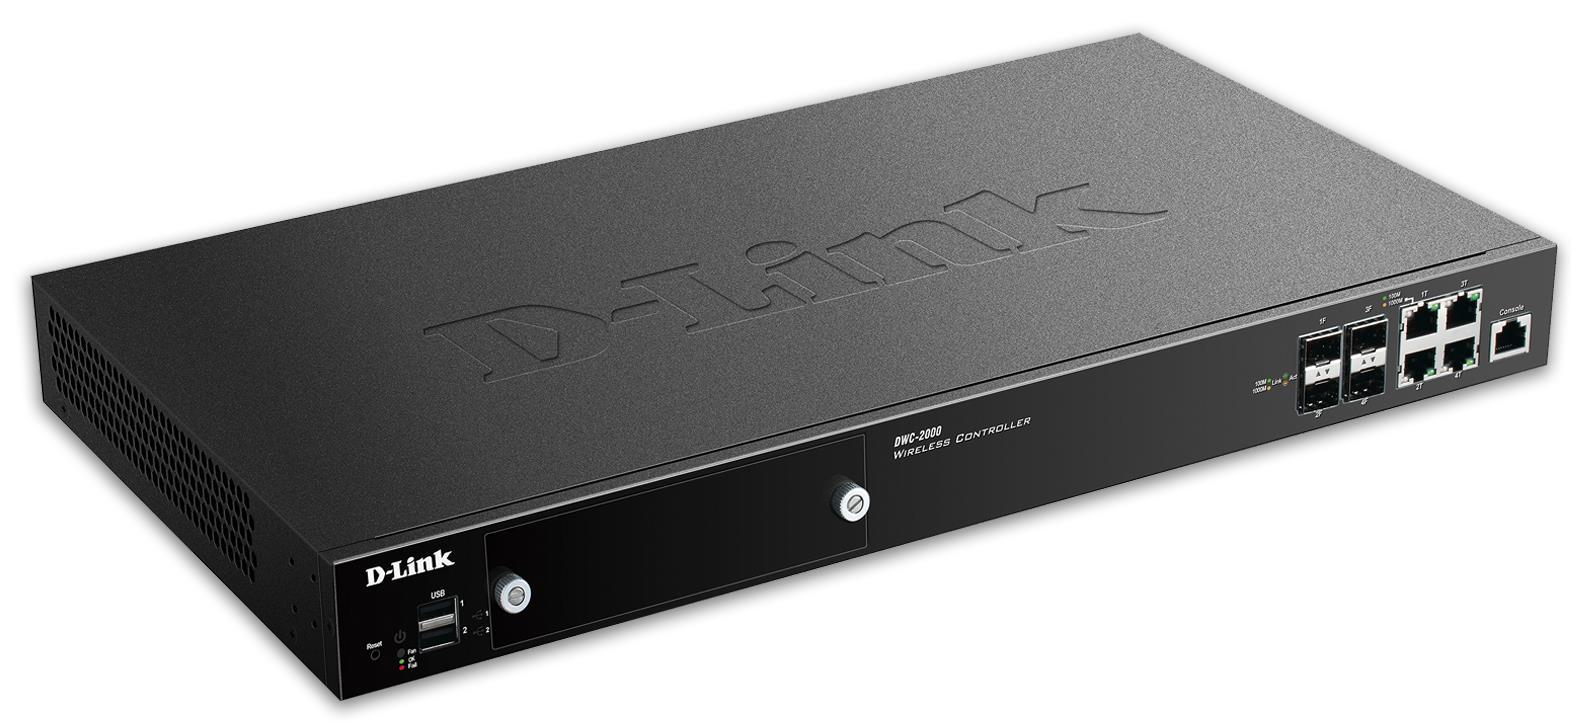 D-Link DWC-2000 4xGLAN Wireless Switch, 64-256AP